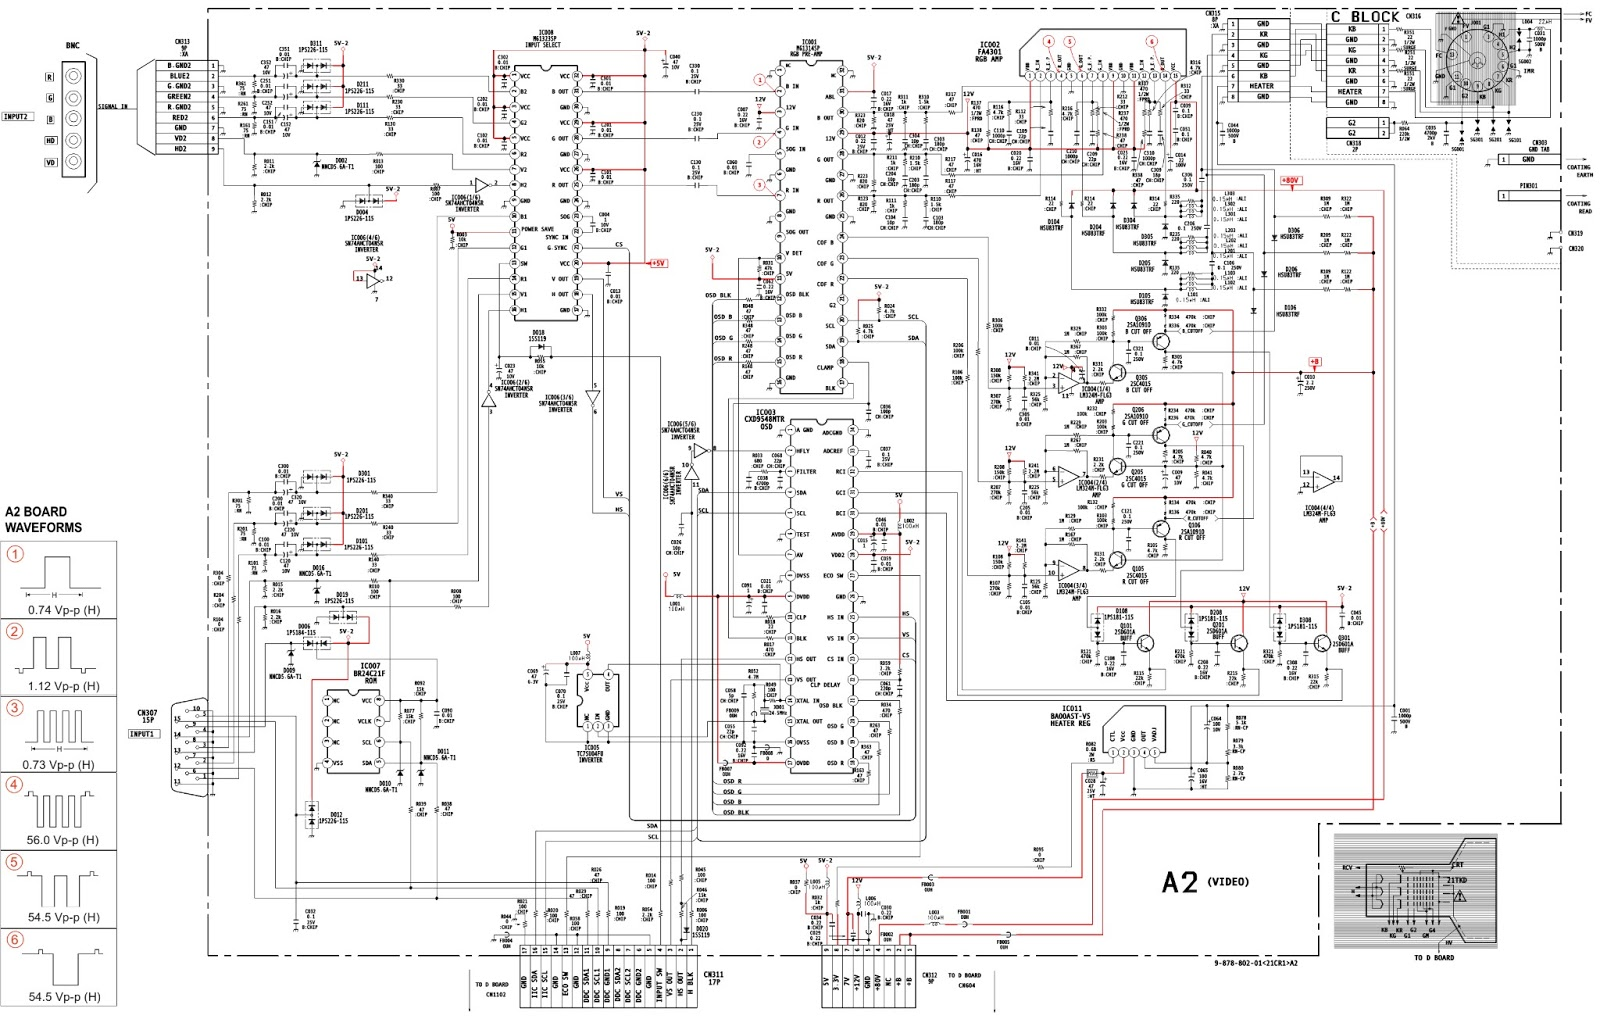 playstation 1 circuit diagram